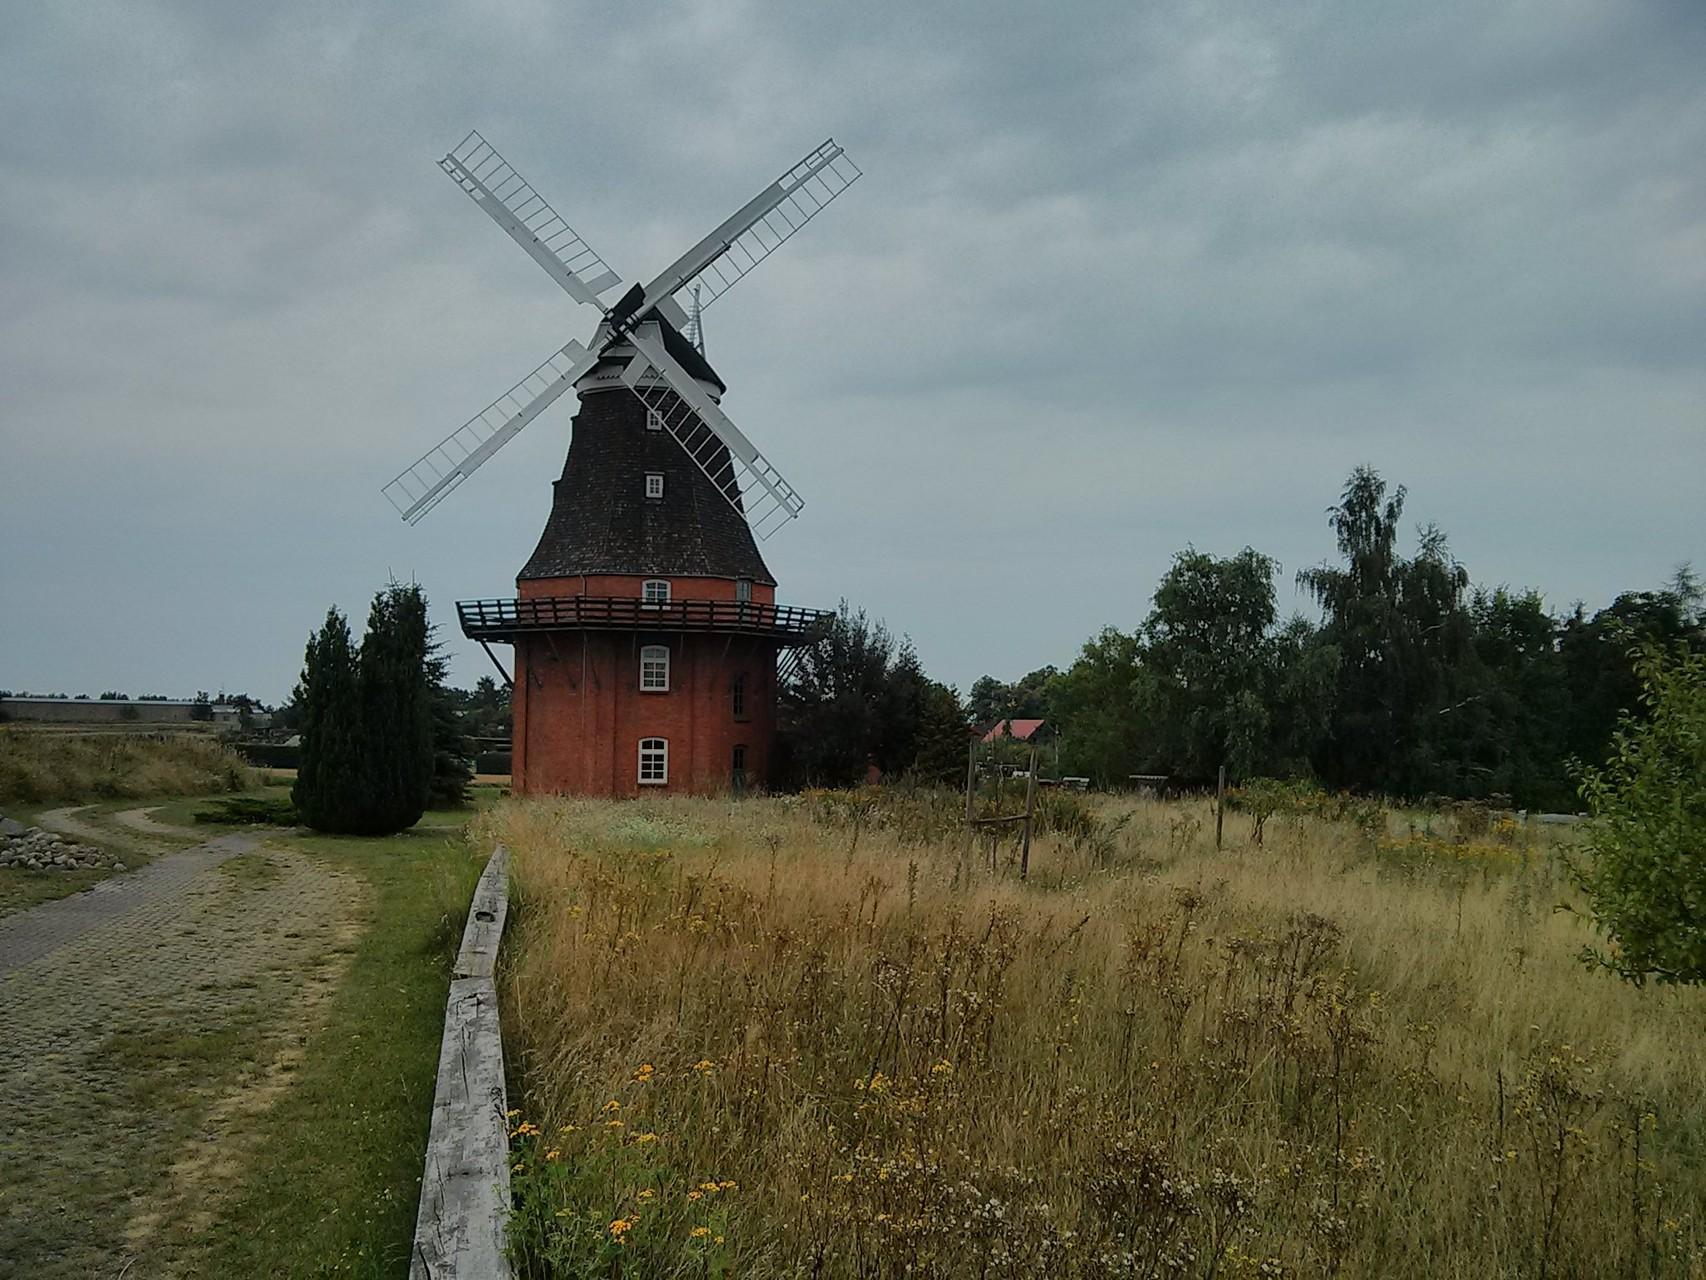 Mühle Friedrichsruhe (Pension)